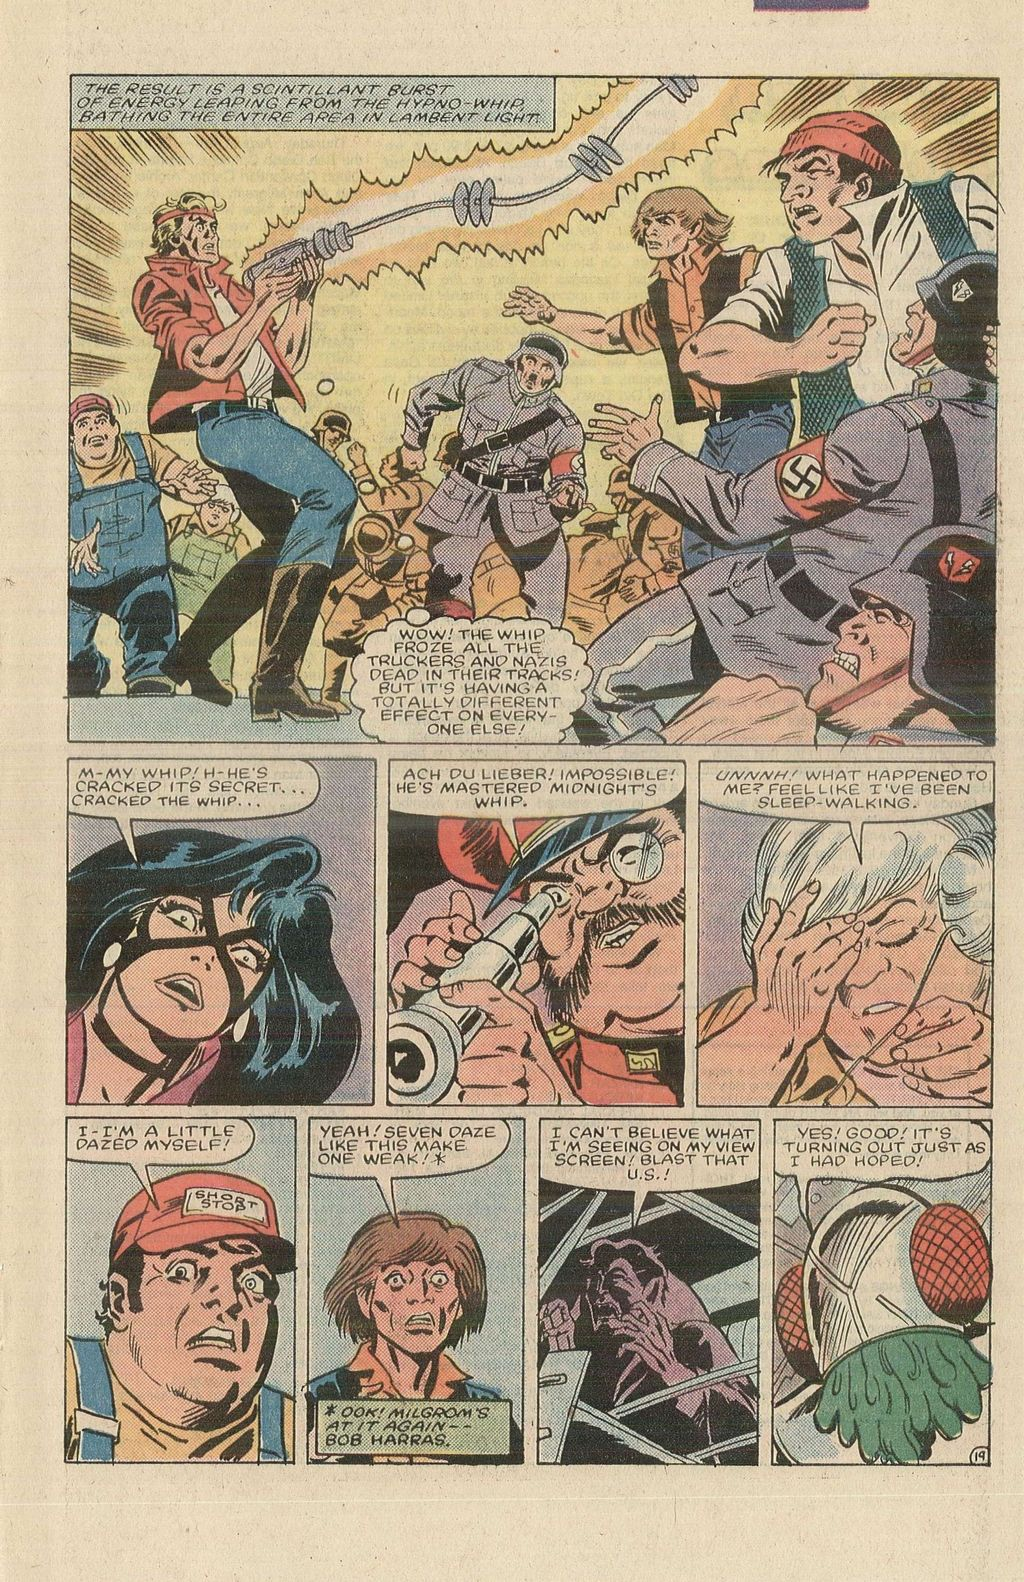 Read online U.S. 1 comic -  Issue #9 - 27